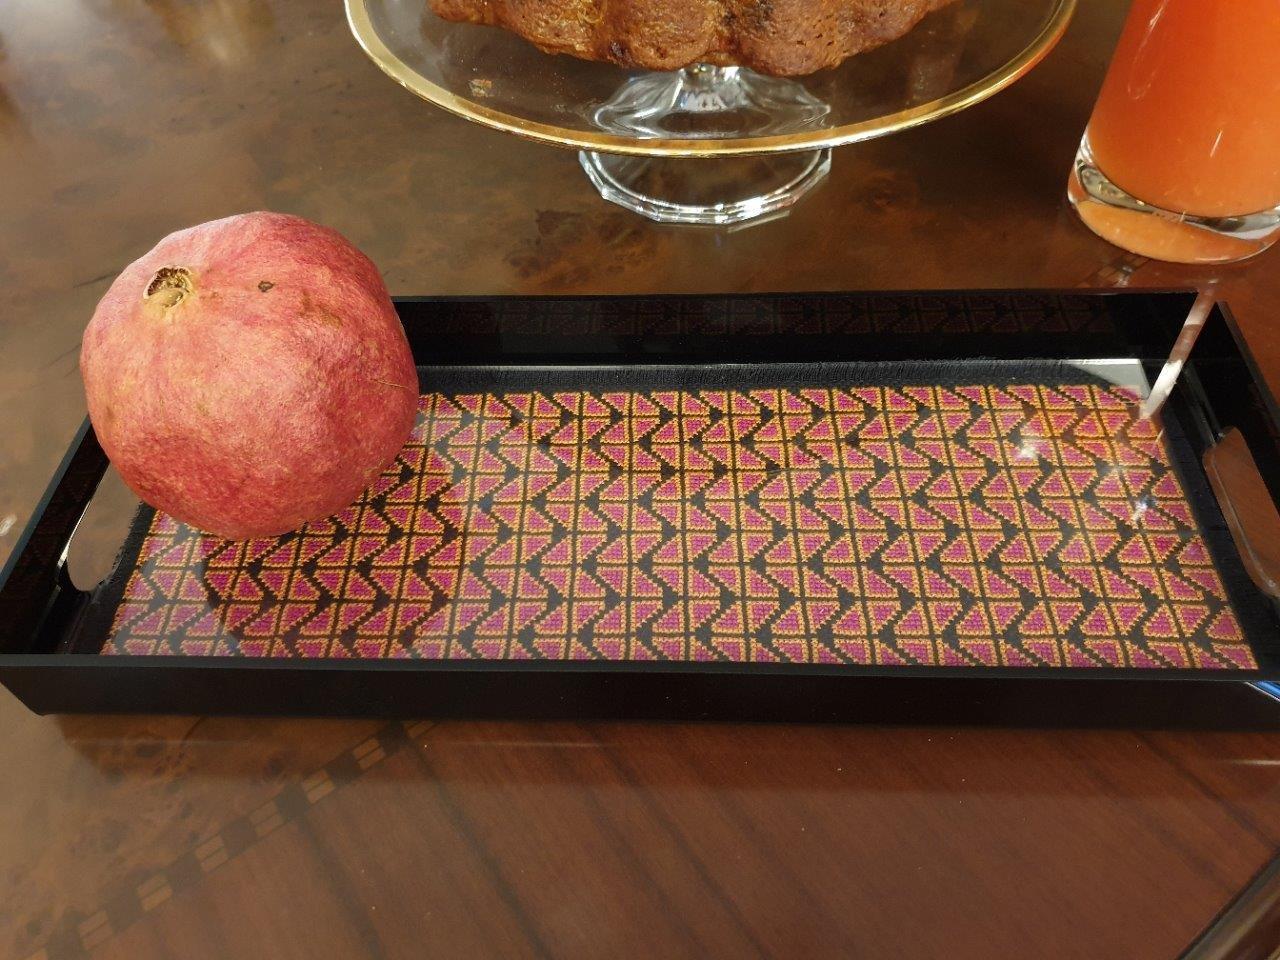 Blossom Plexi Tray w/ Embroidered Insert